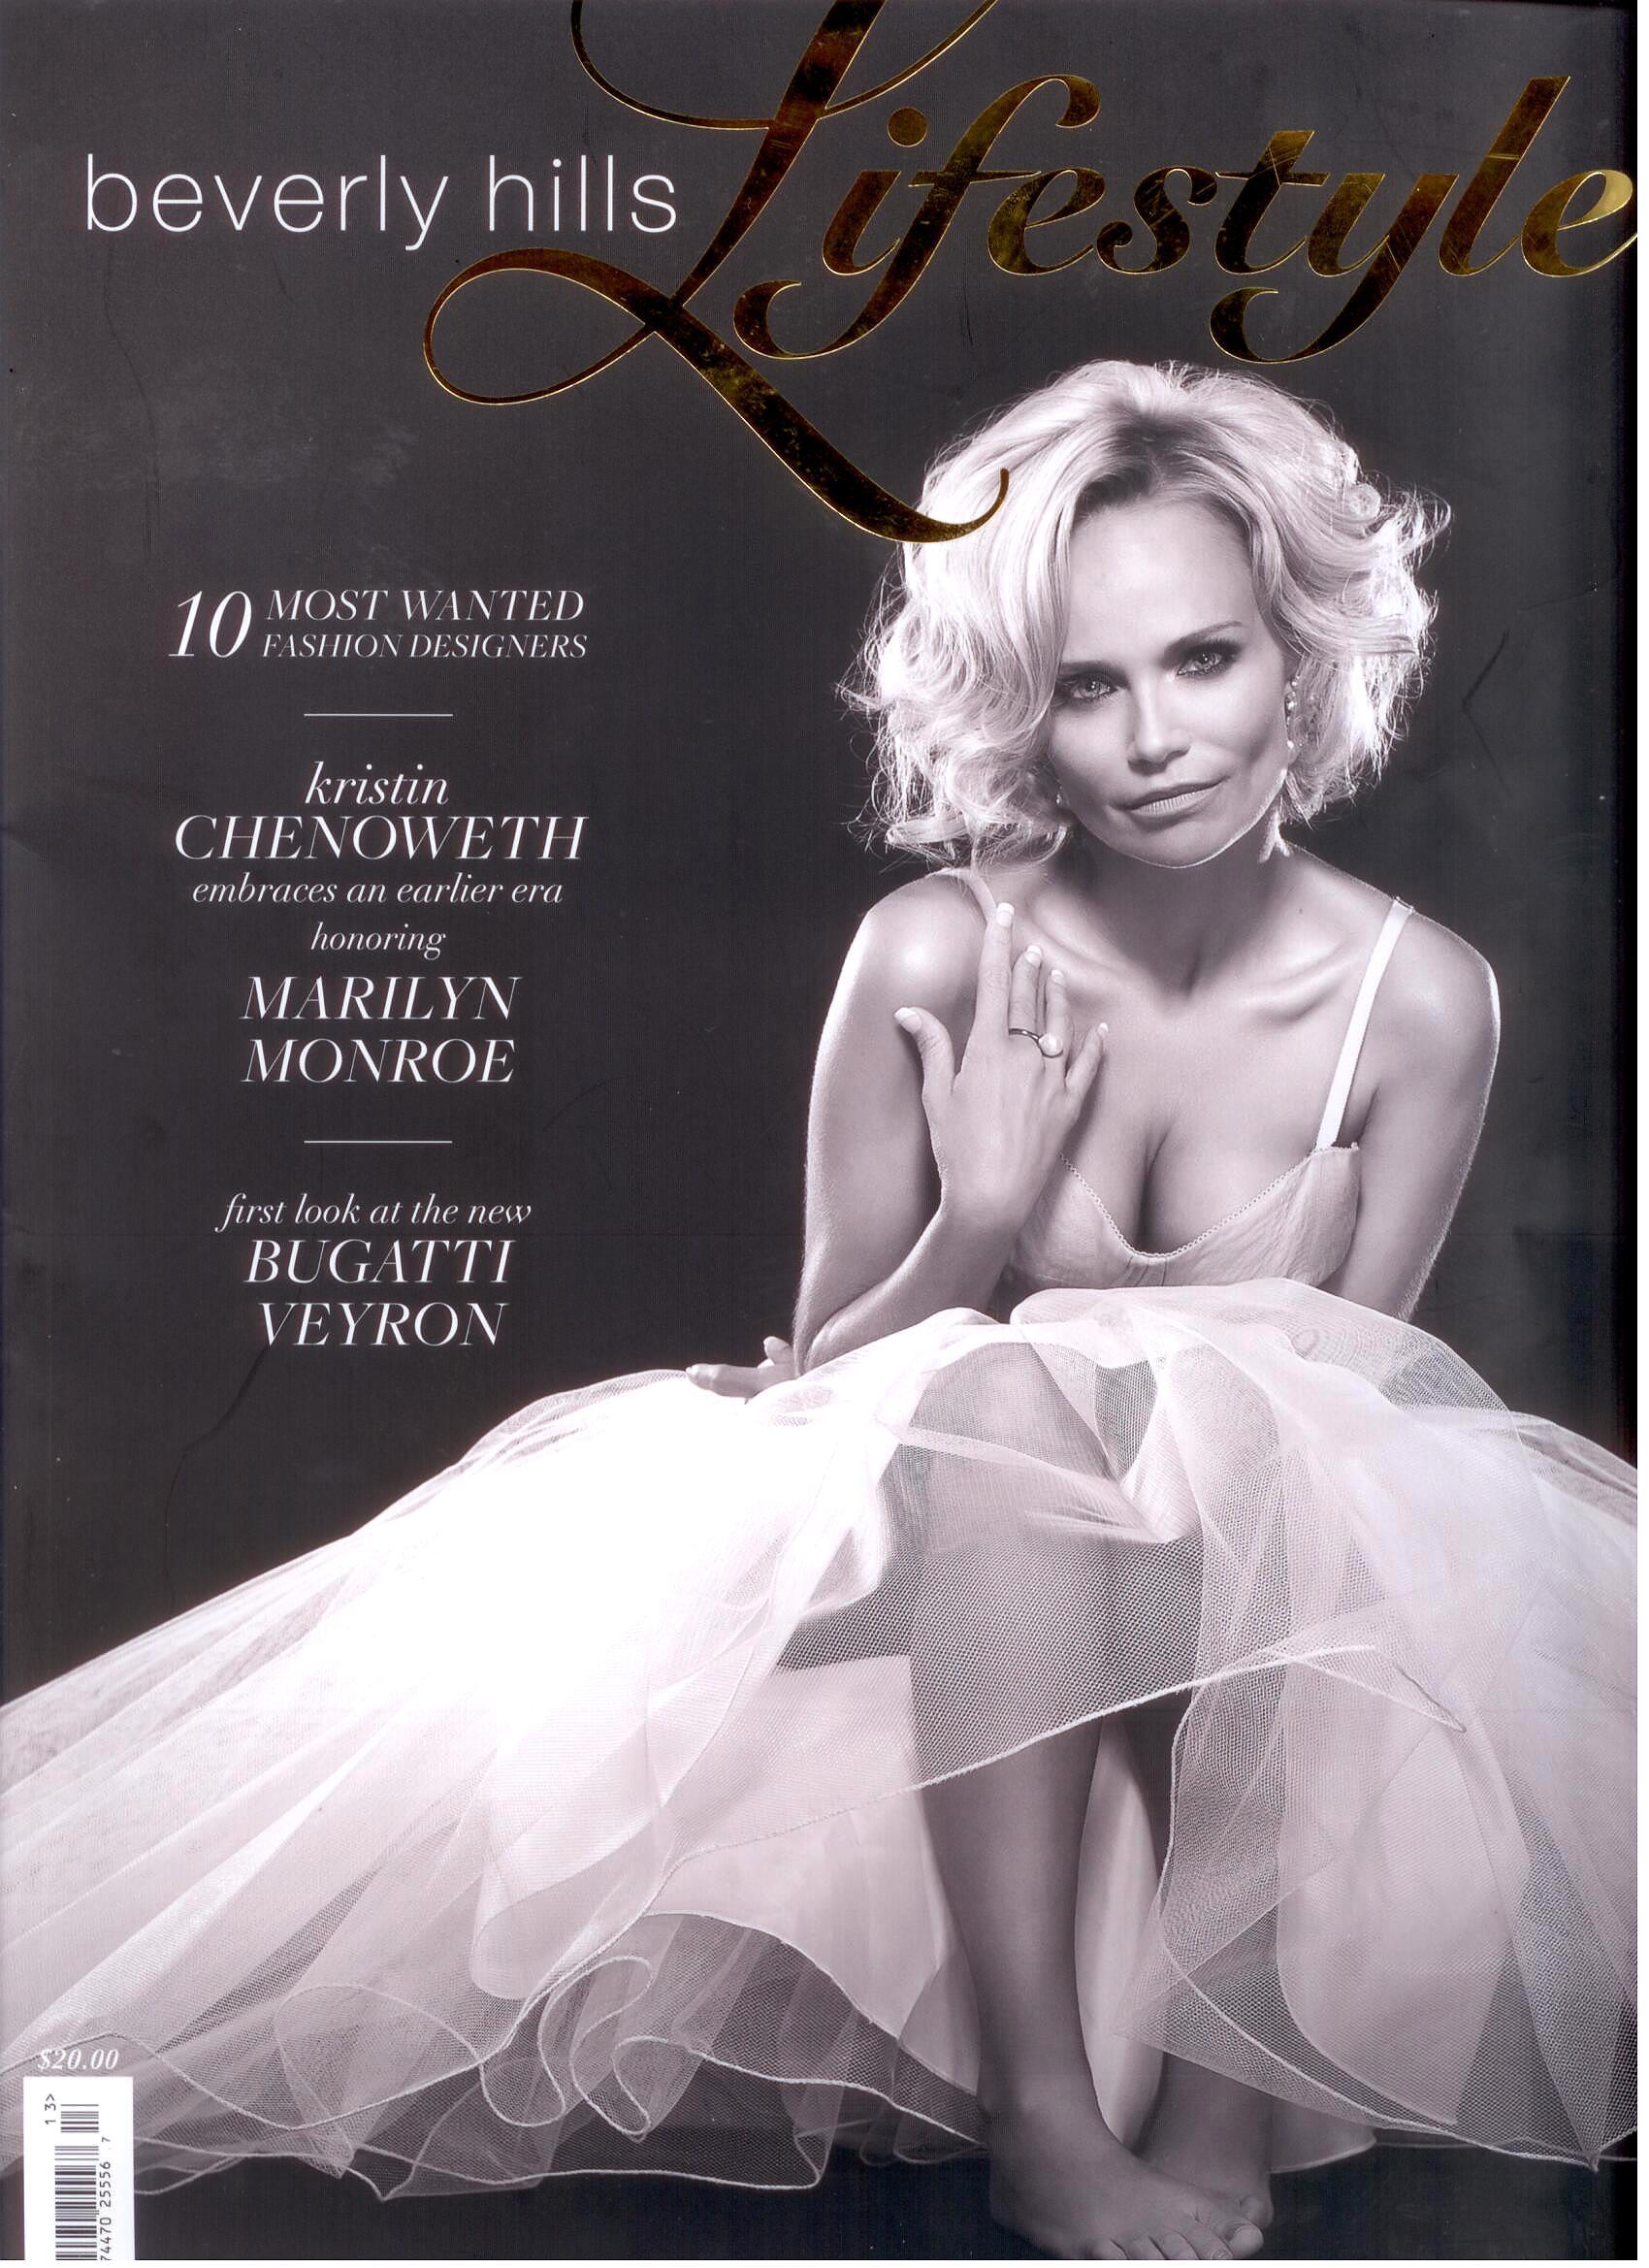 Lifestyle-Beverly-Hills-Magazine-Cover.jpg